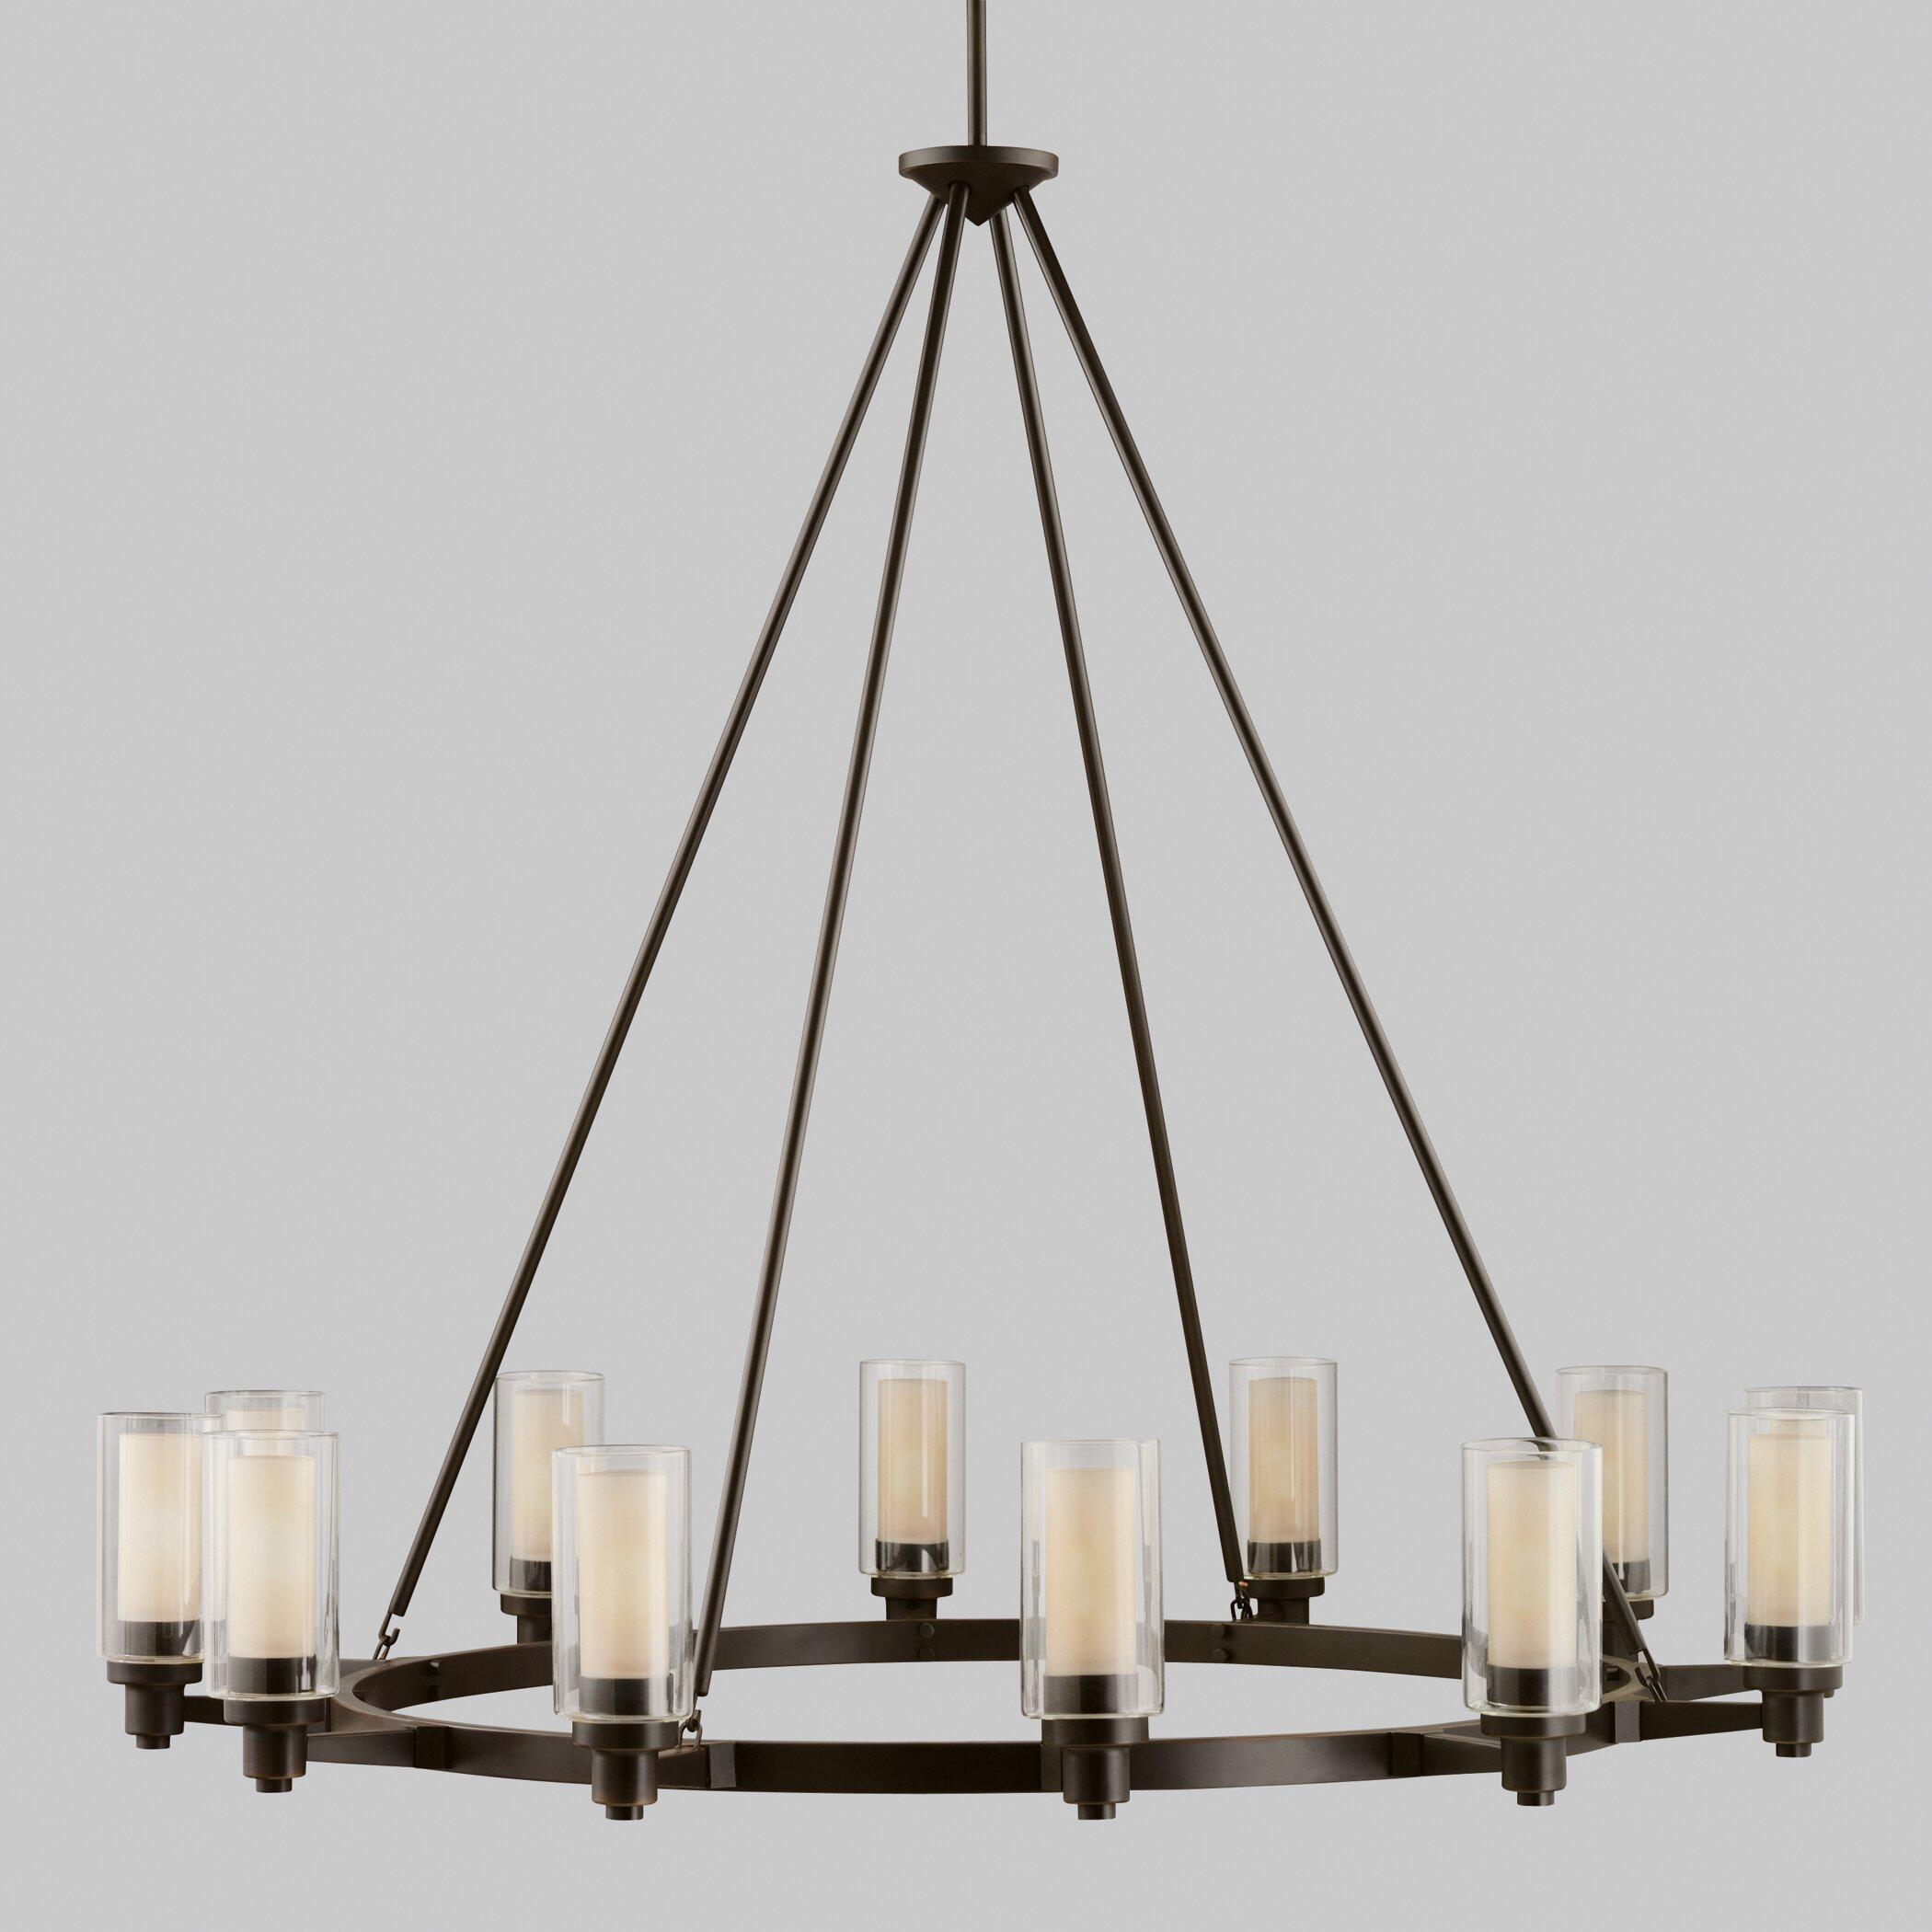 Kichler circolo 12 light chandelier reviews wayfair - Kichler dining room lighting ...